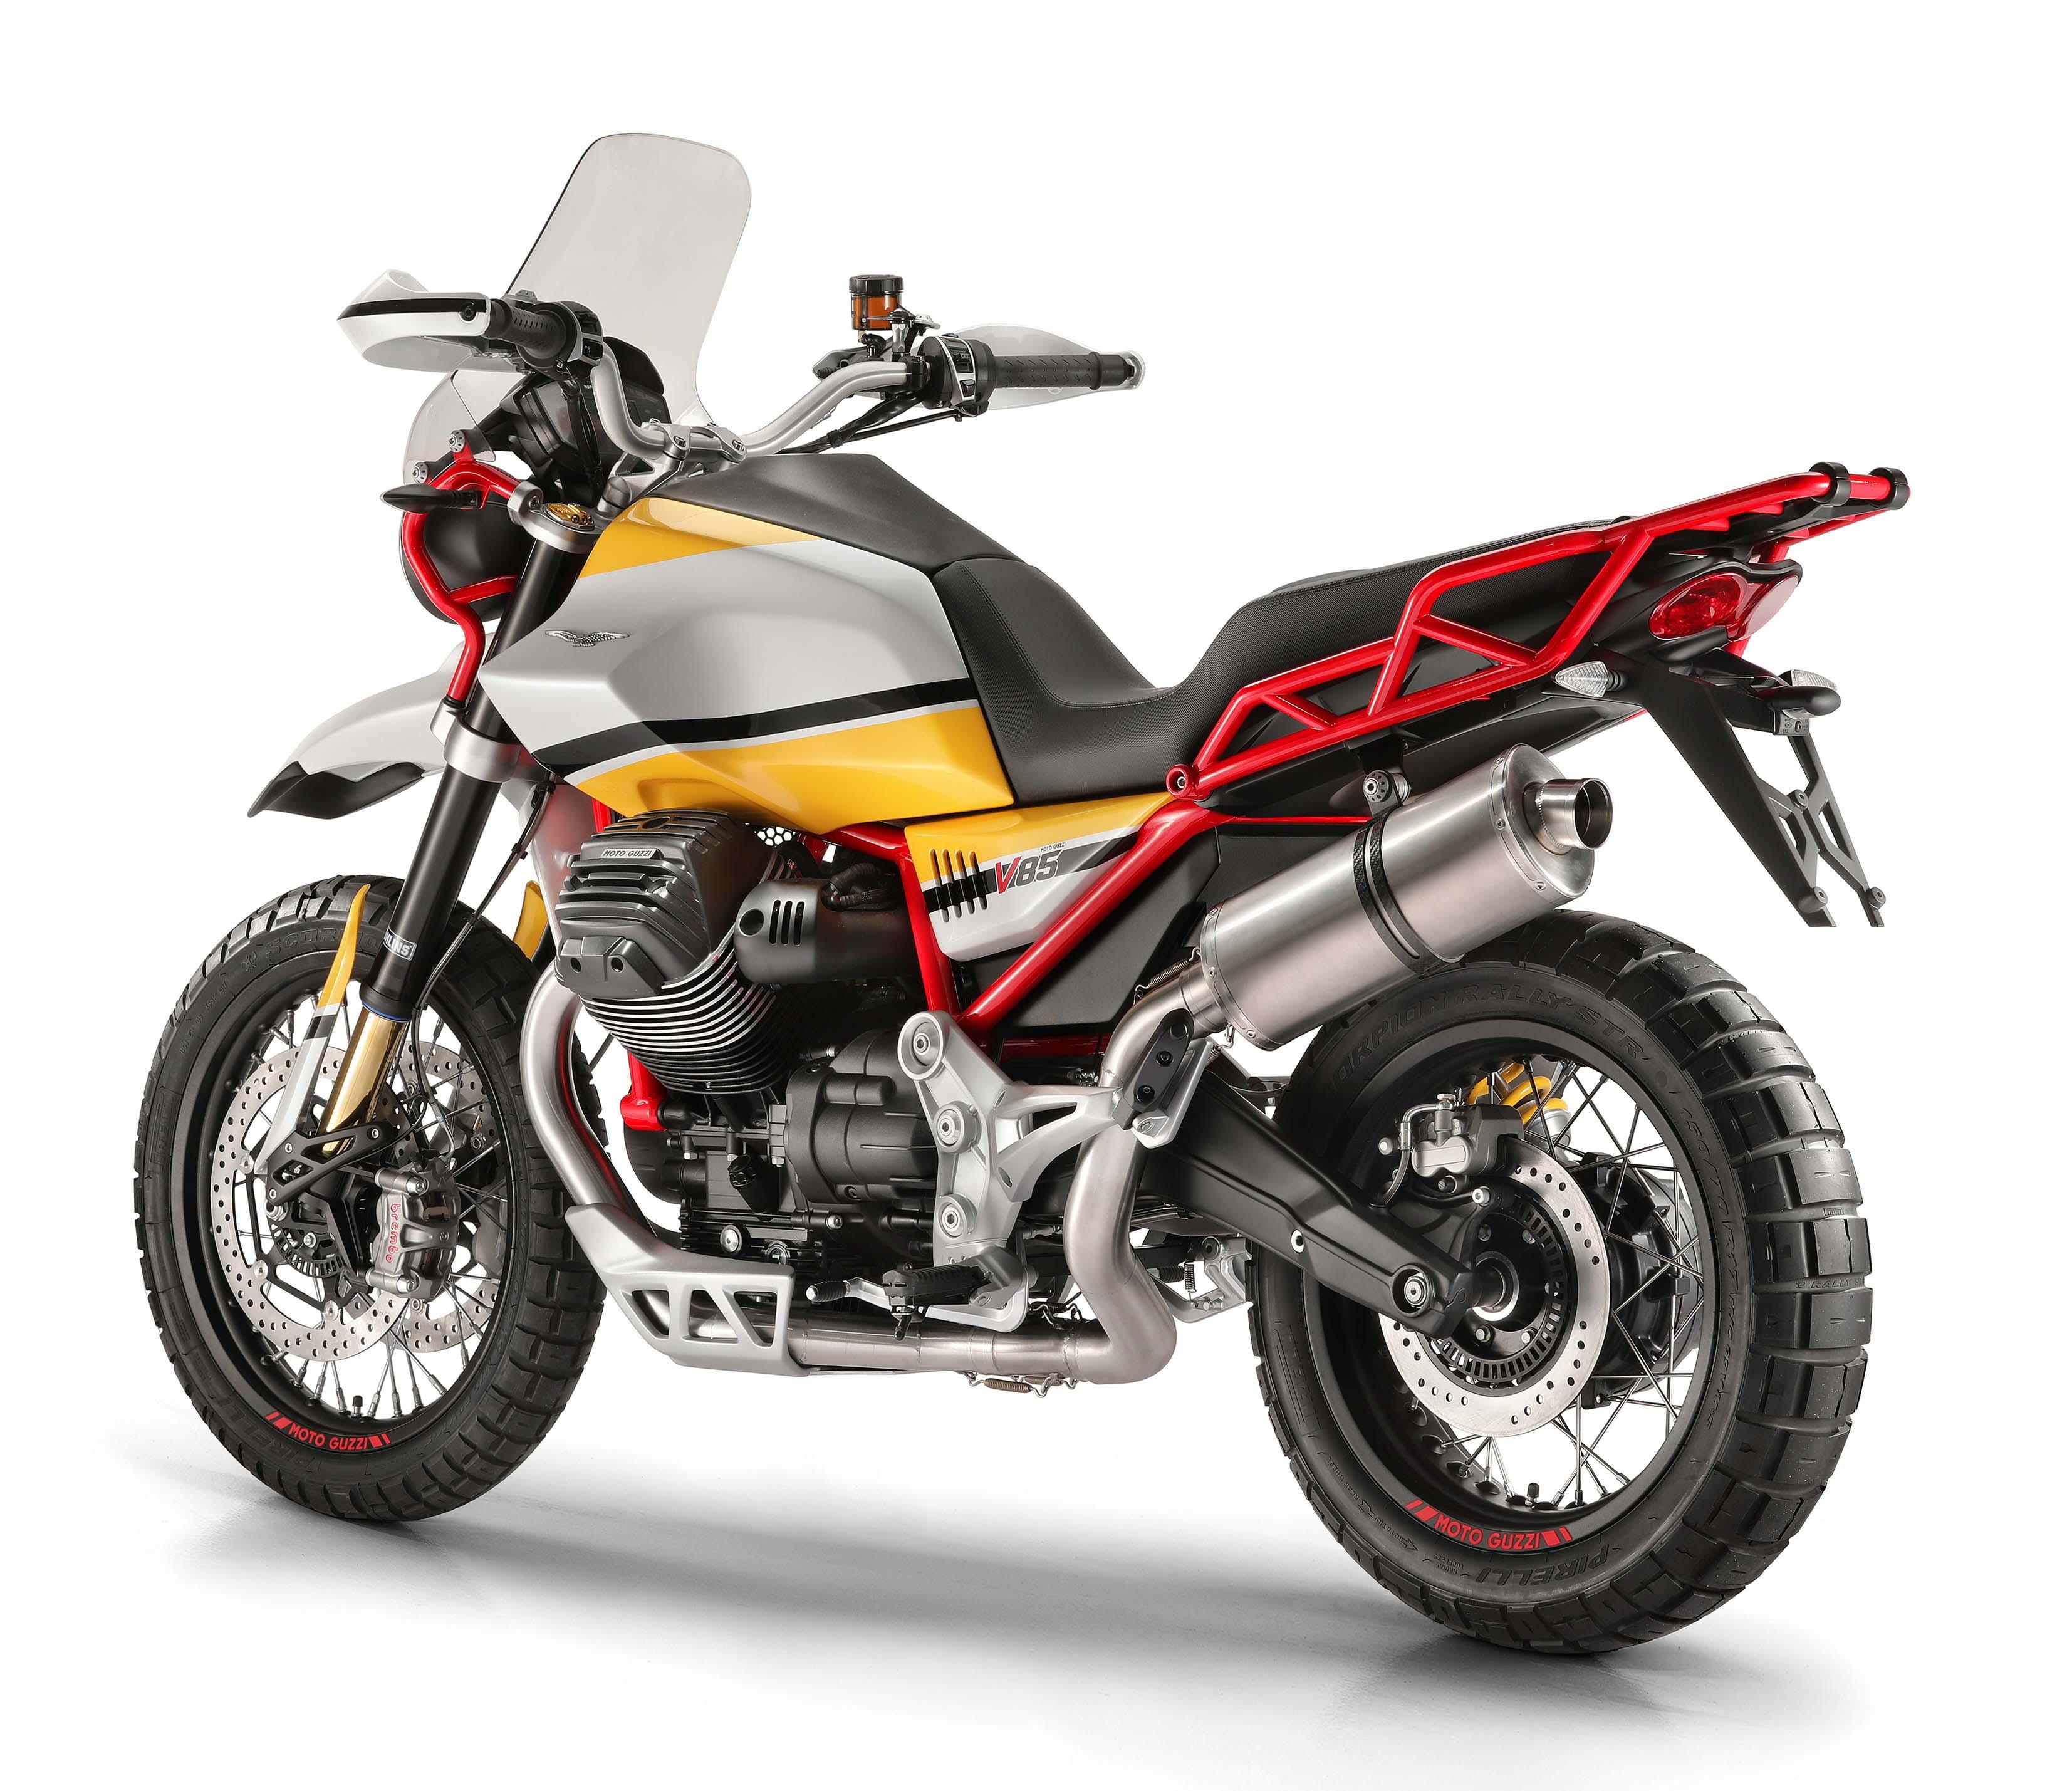 moto guzzi v85 a new platform a new enduro asphalt rubber. Black Bedroom Furniture Sets. Home Design Ideas